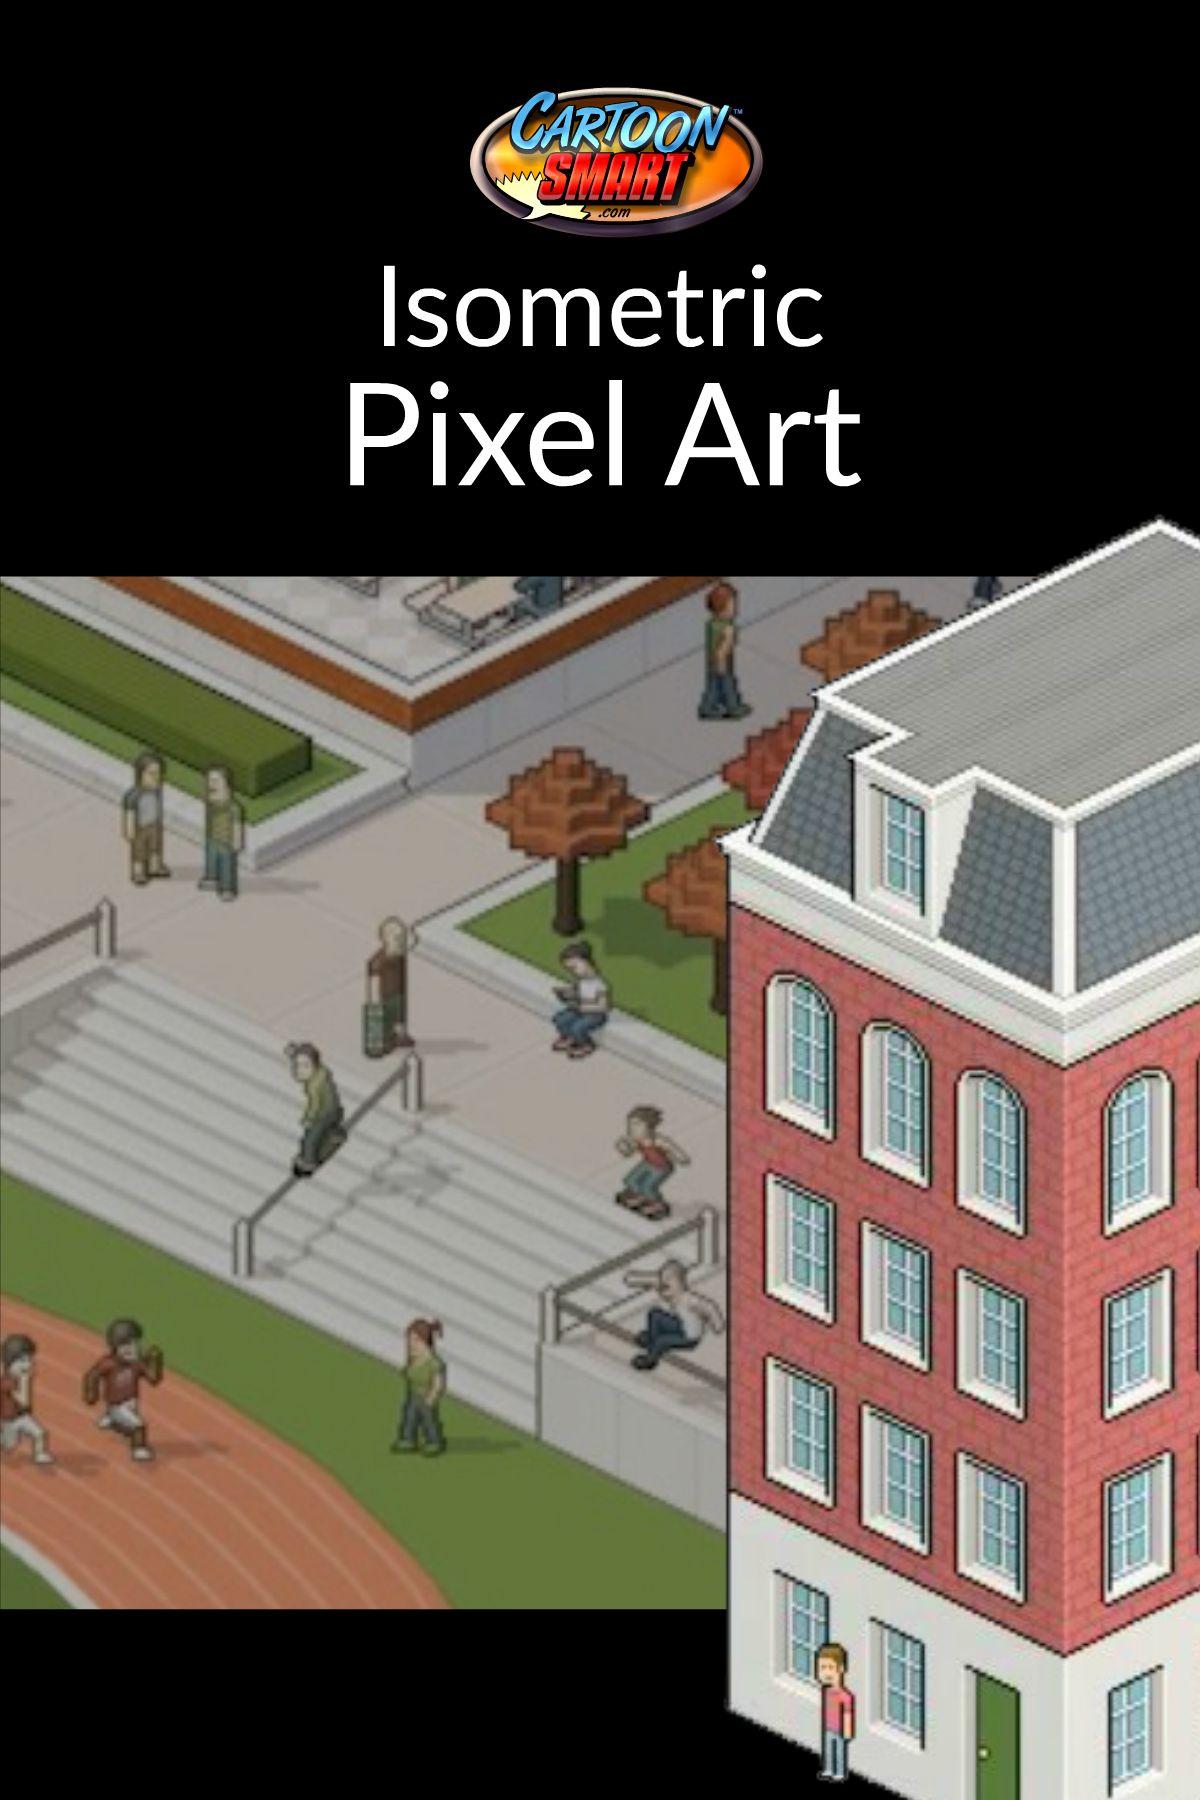 Isometric Pixel Art Video Tutorial